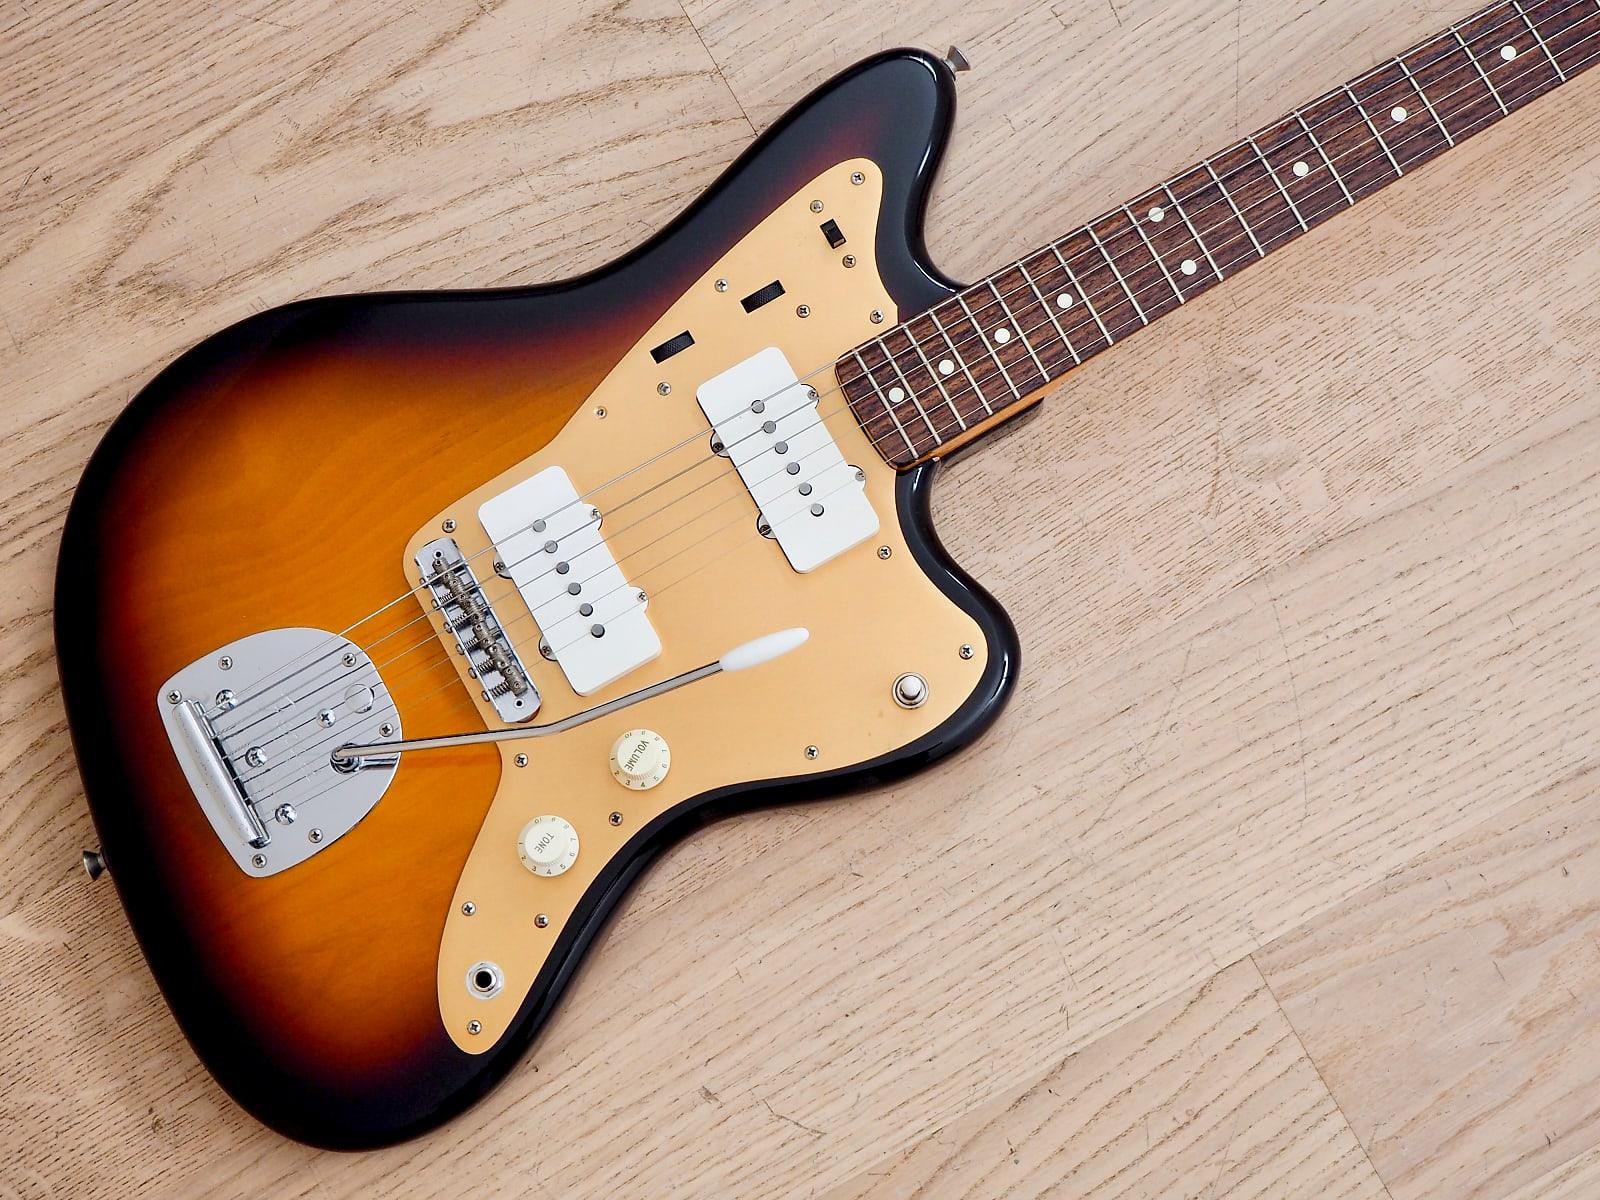 Seymour Duncan SJM-1n//1b Vintage Fender Jazzmaster Guitar Pickup Set